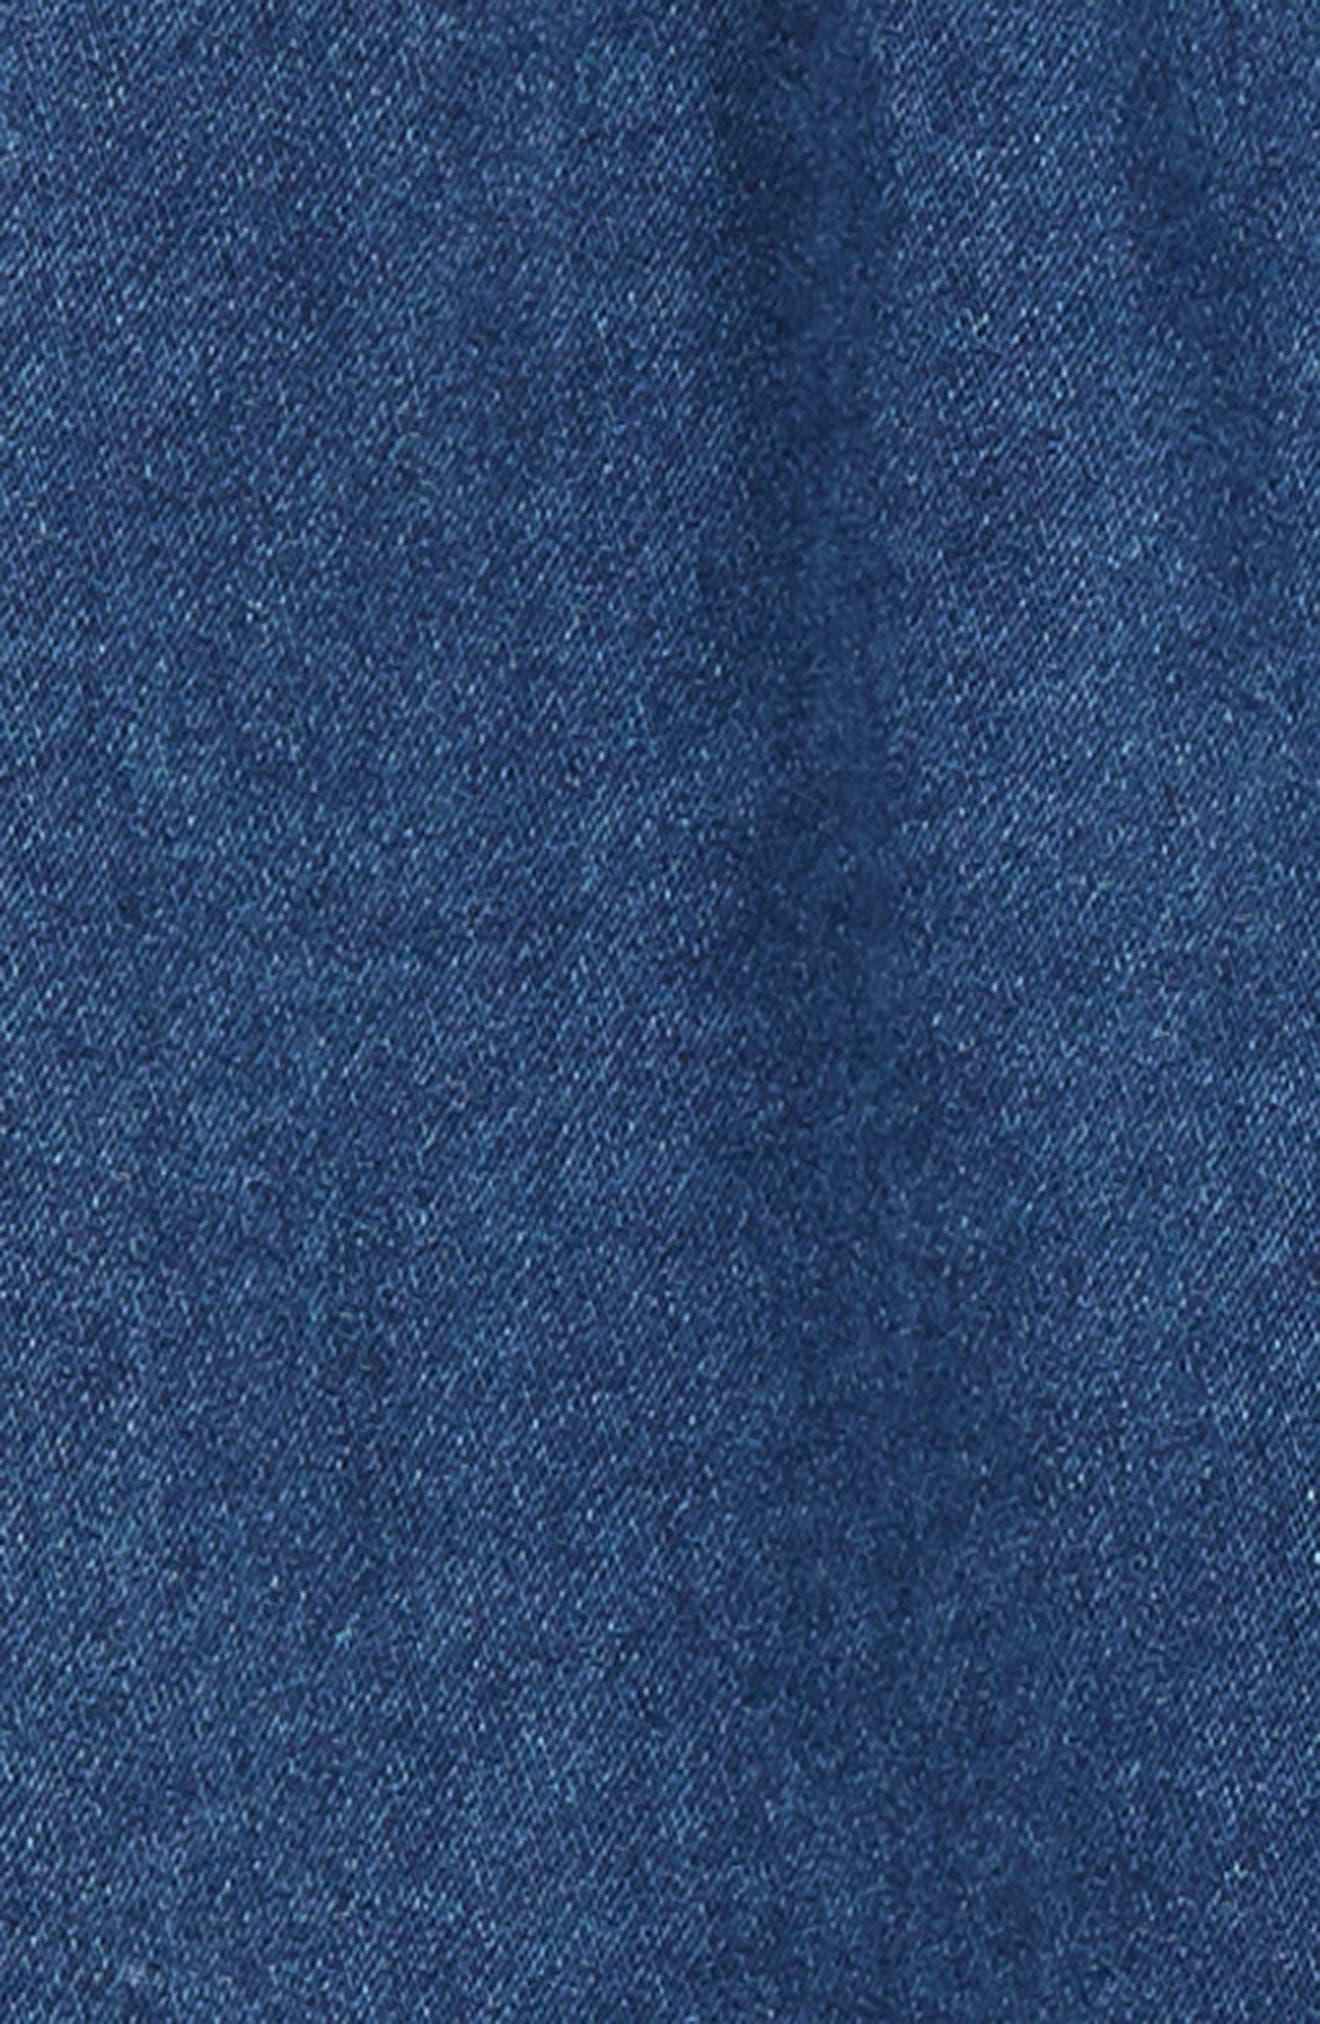 Basic Denim Pants,                             Alternate thumbnail 2, color,                             DENIM